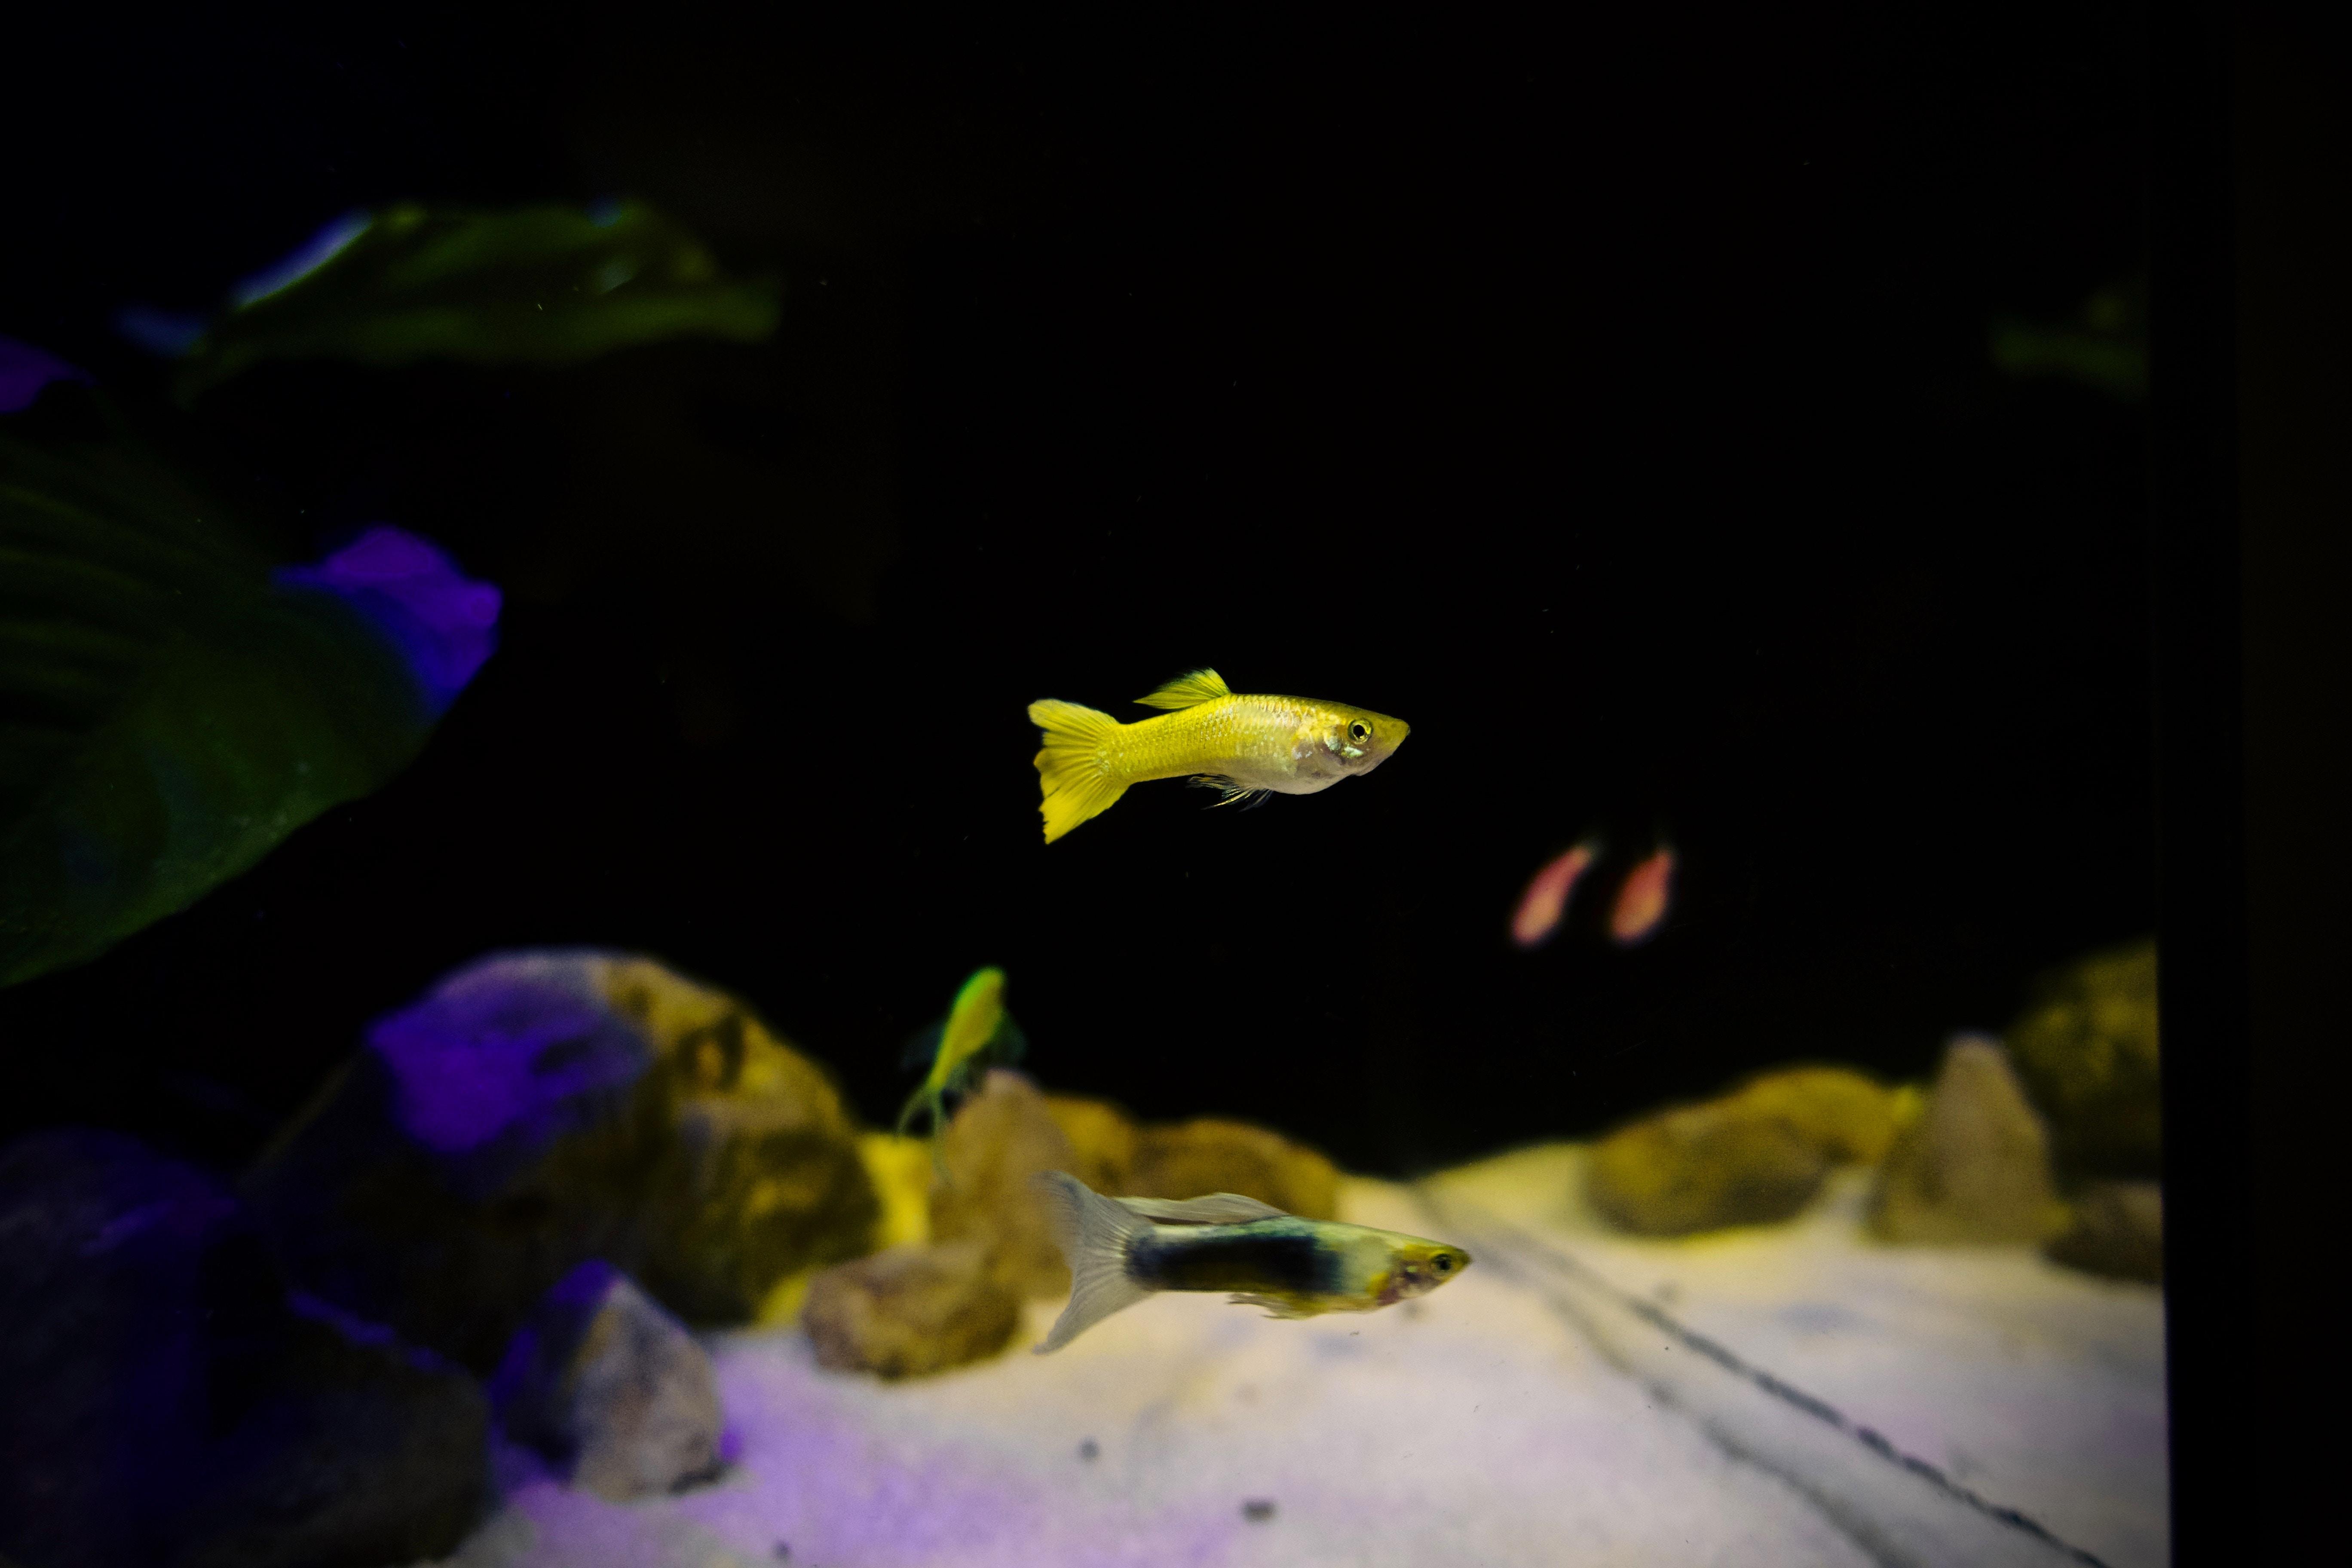 yellow guppy fish close-up photography